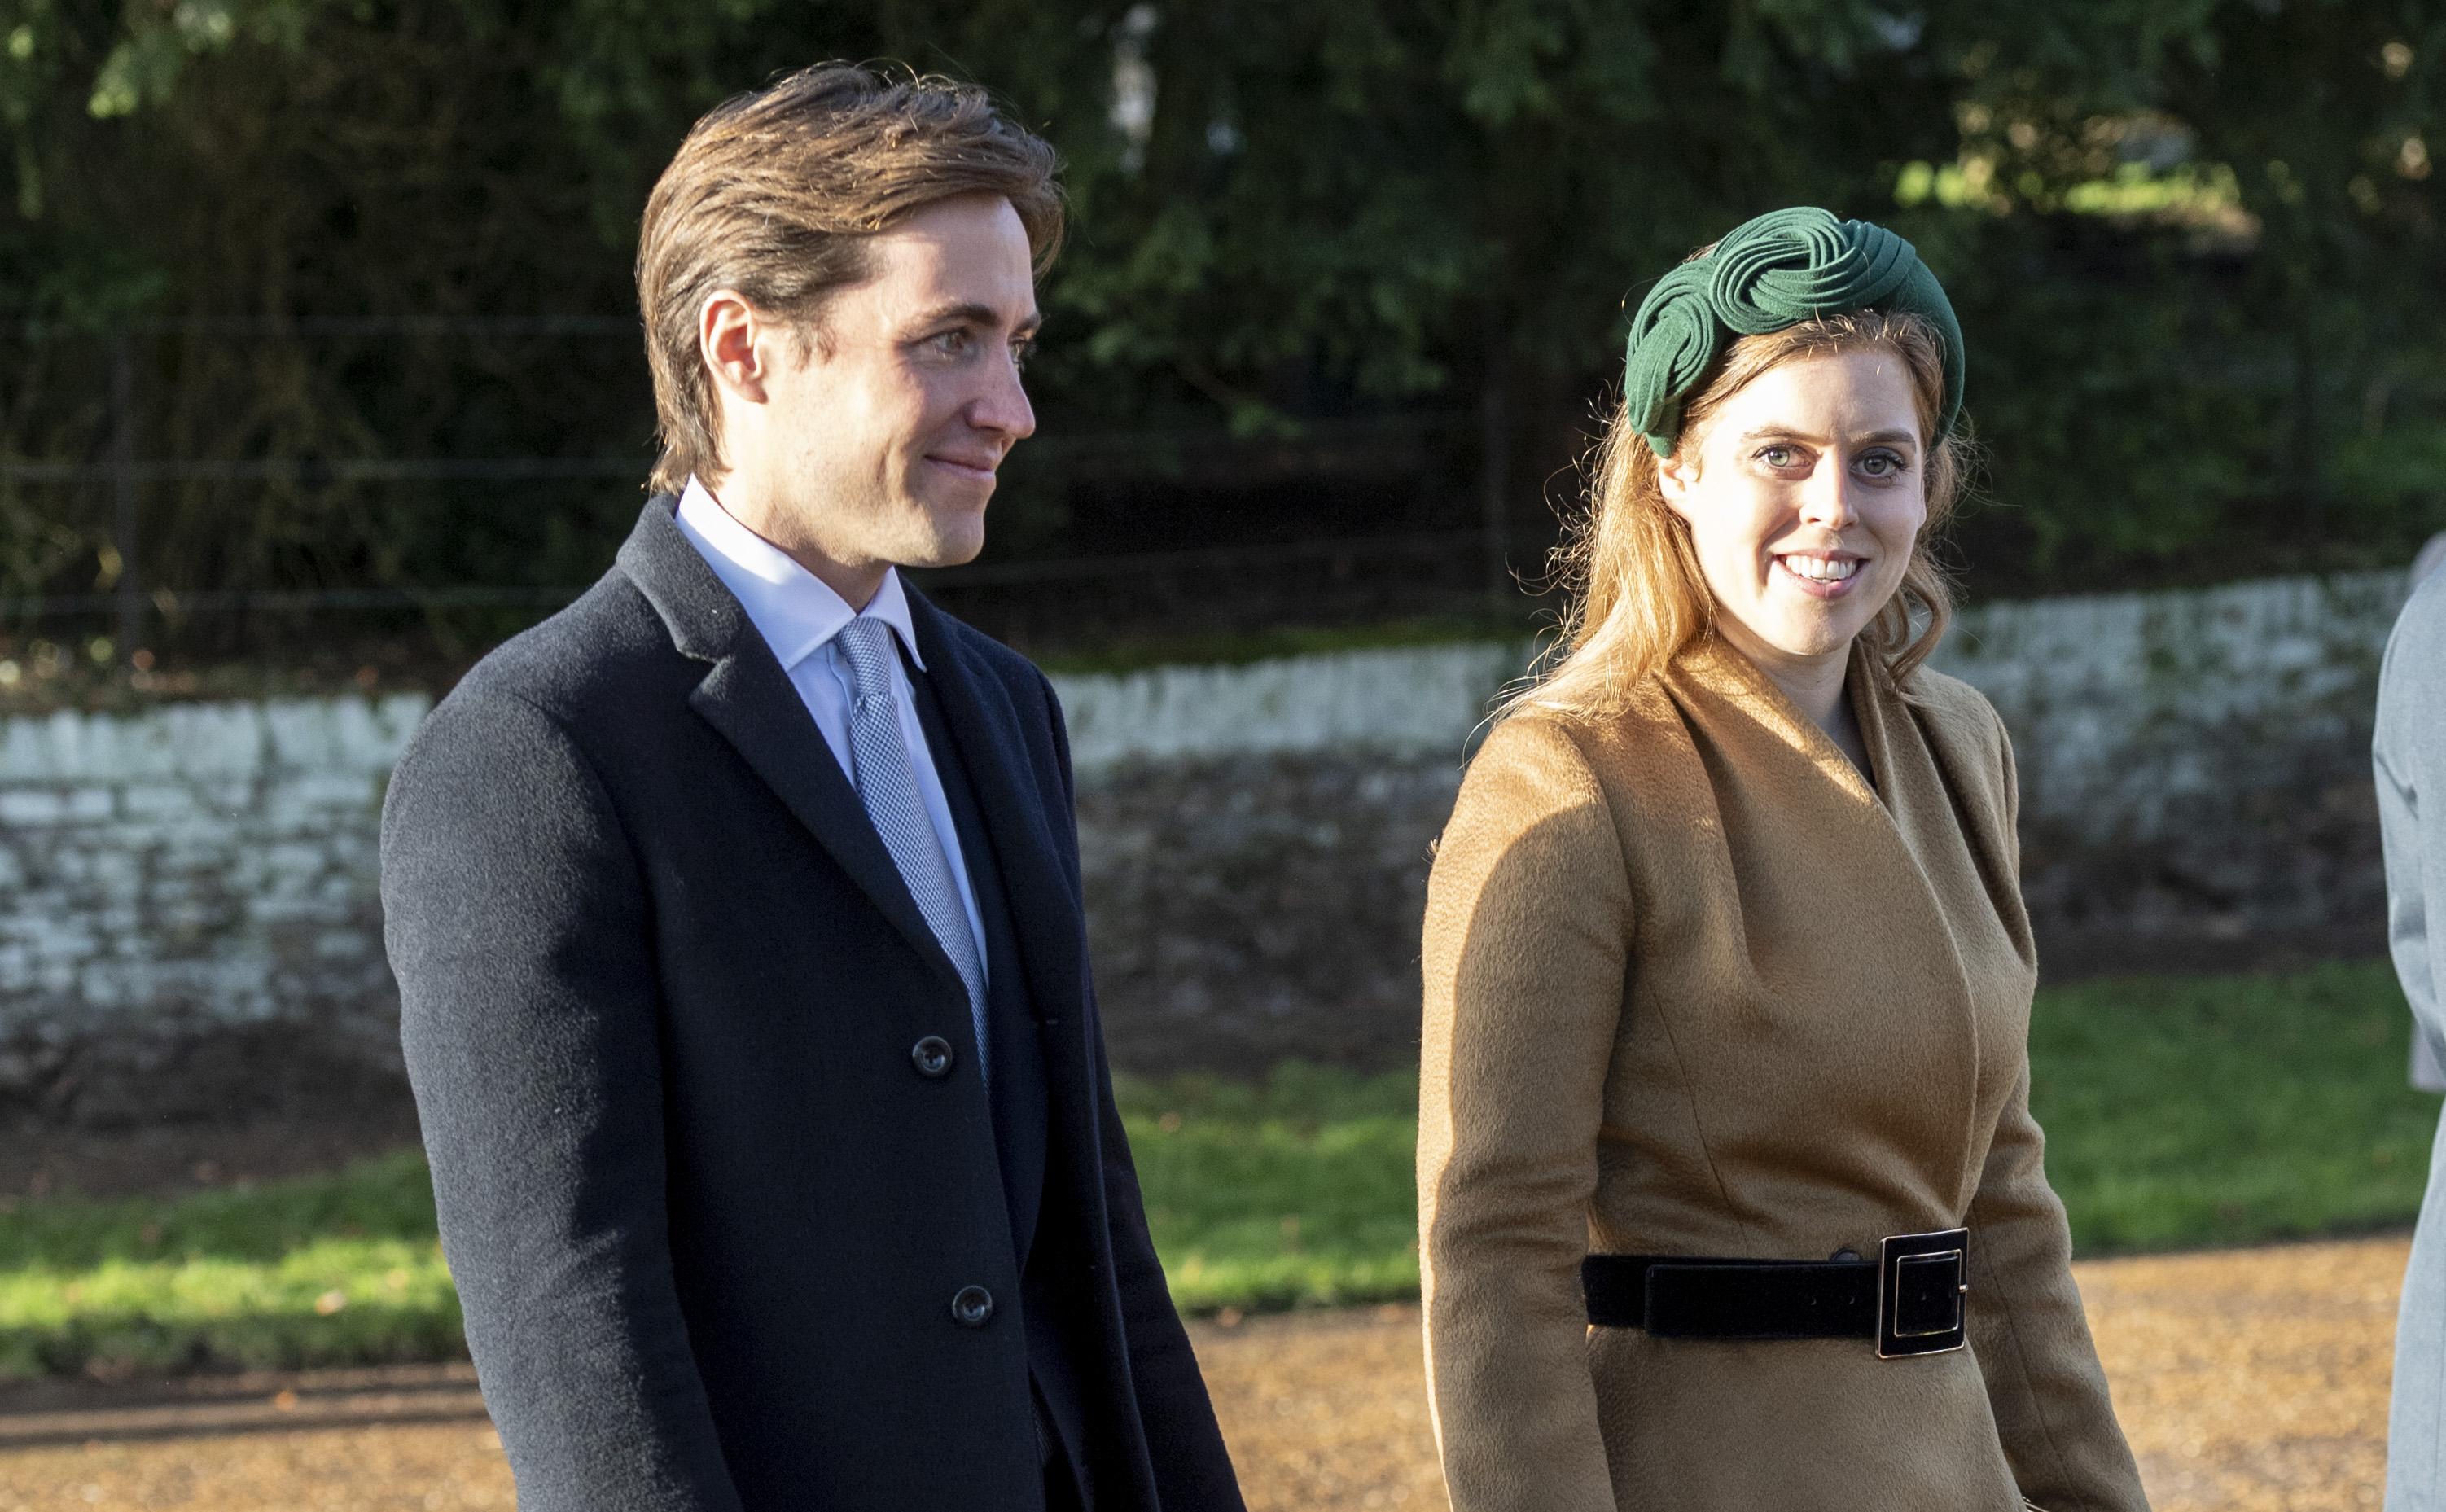 Princesa Beatrice e Edoardo Mozziconi